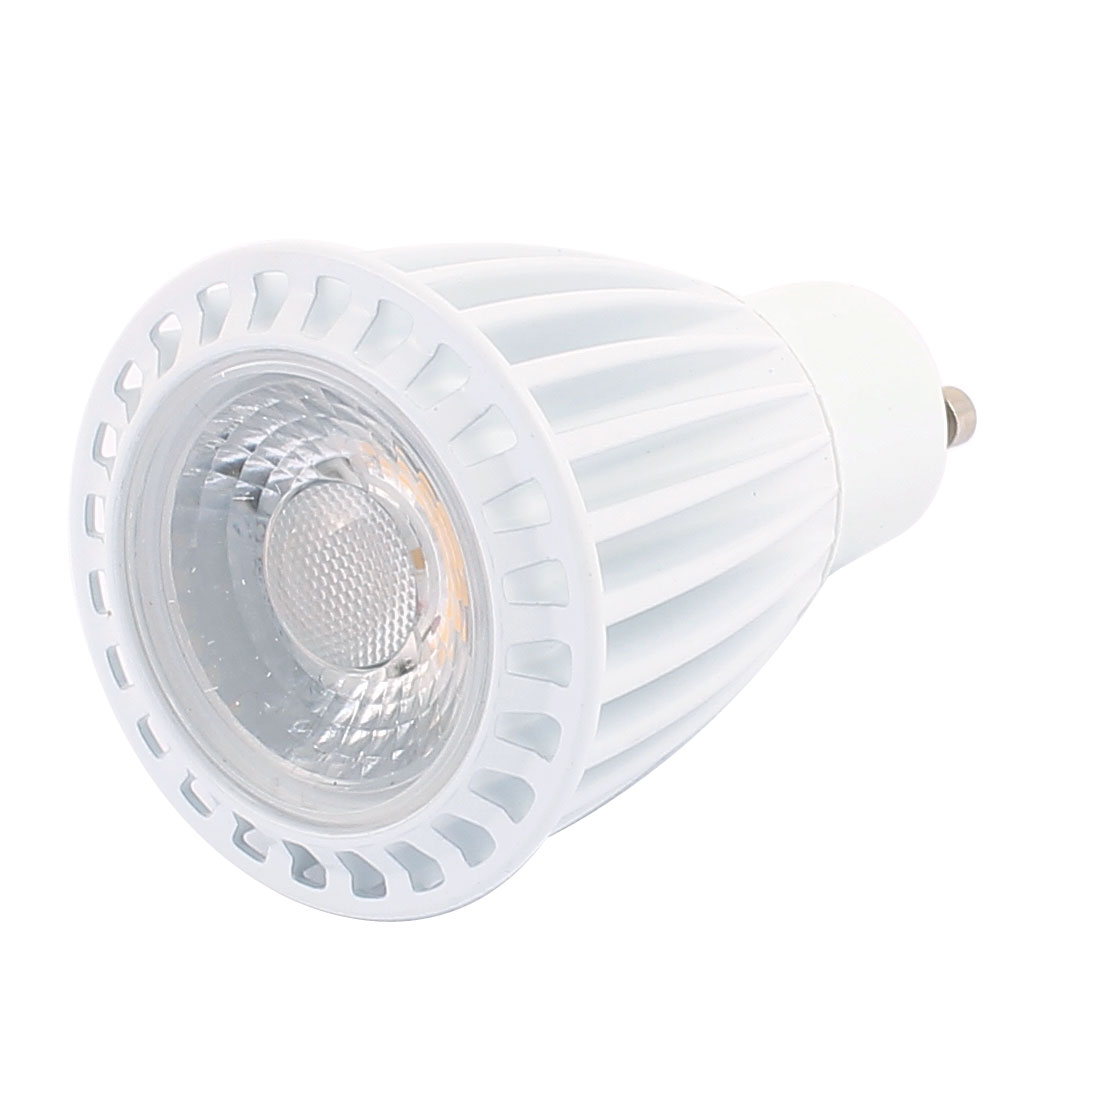 AC85-265V 7W GU10 Base COB LED Spotlight Bulb Downlight Energy Saving Warm White